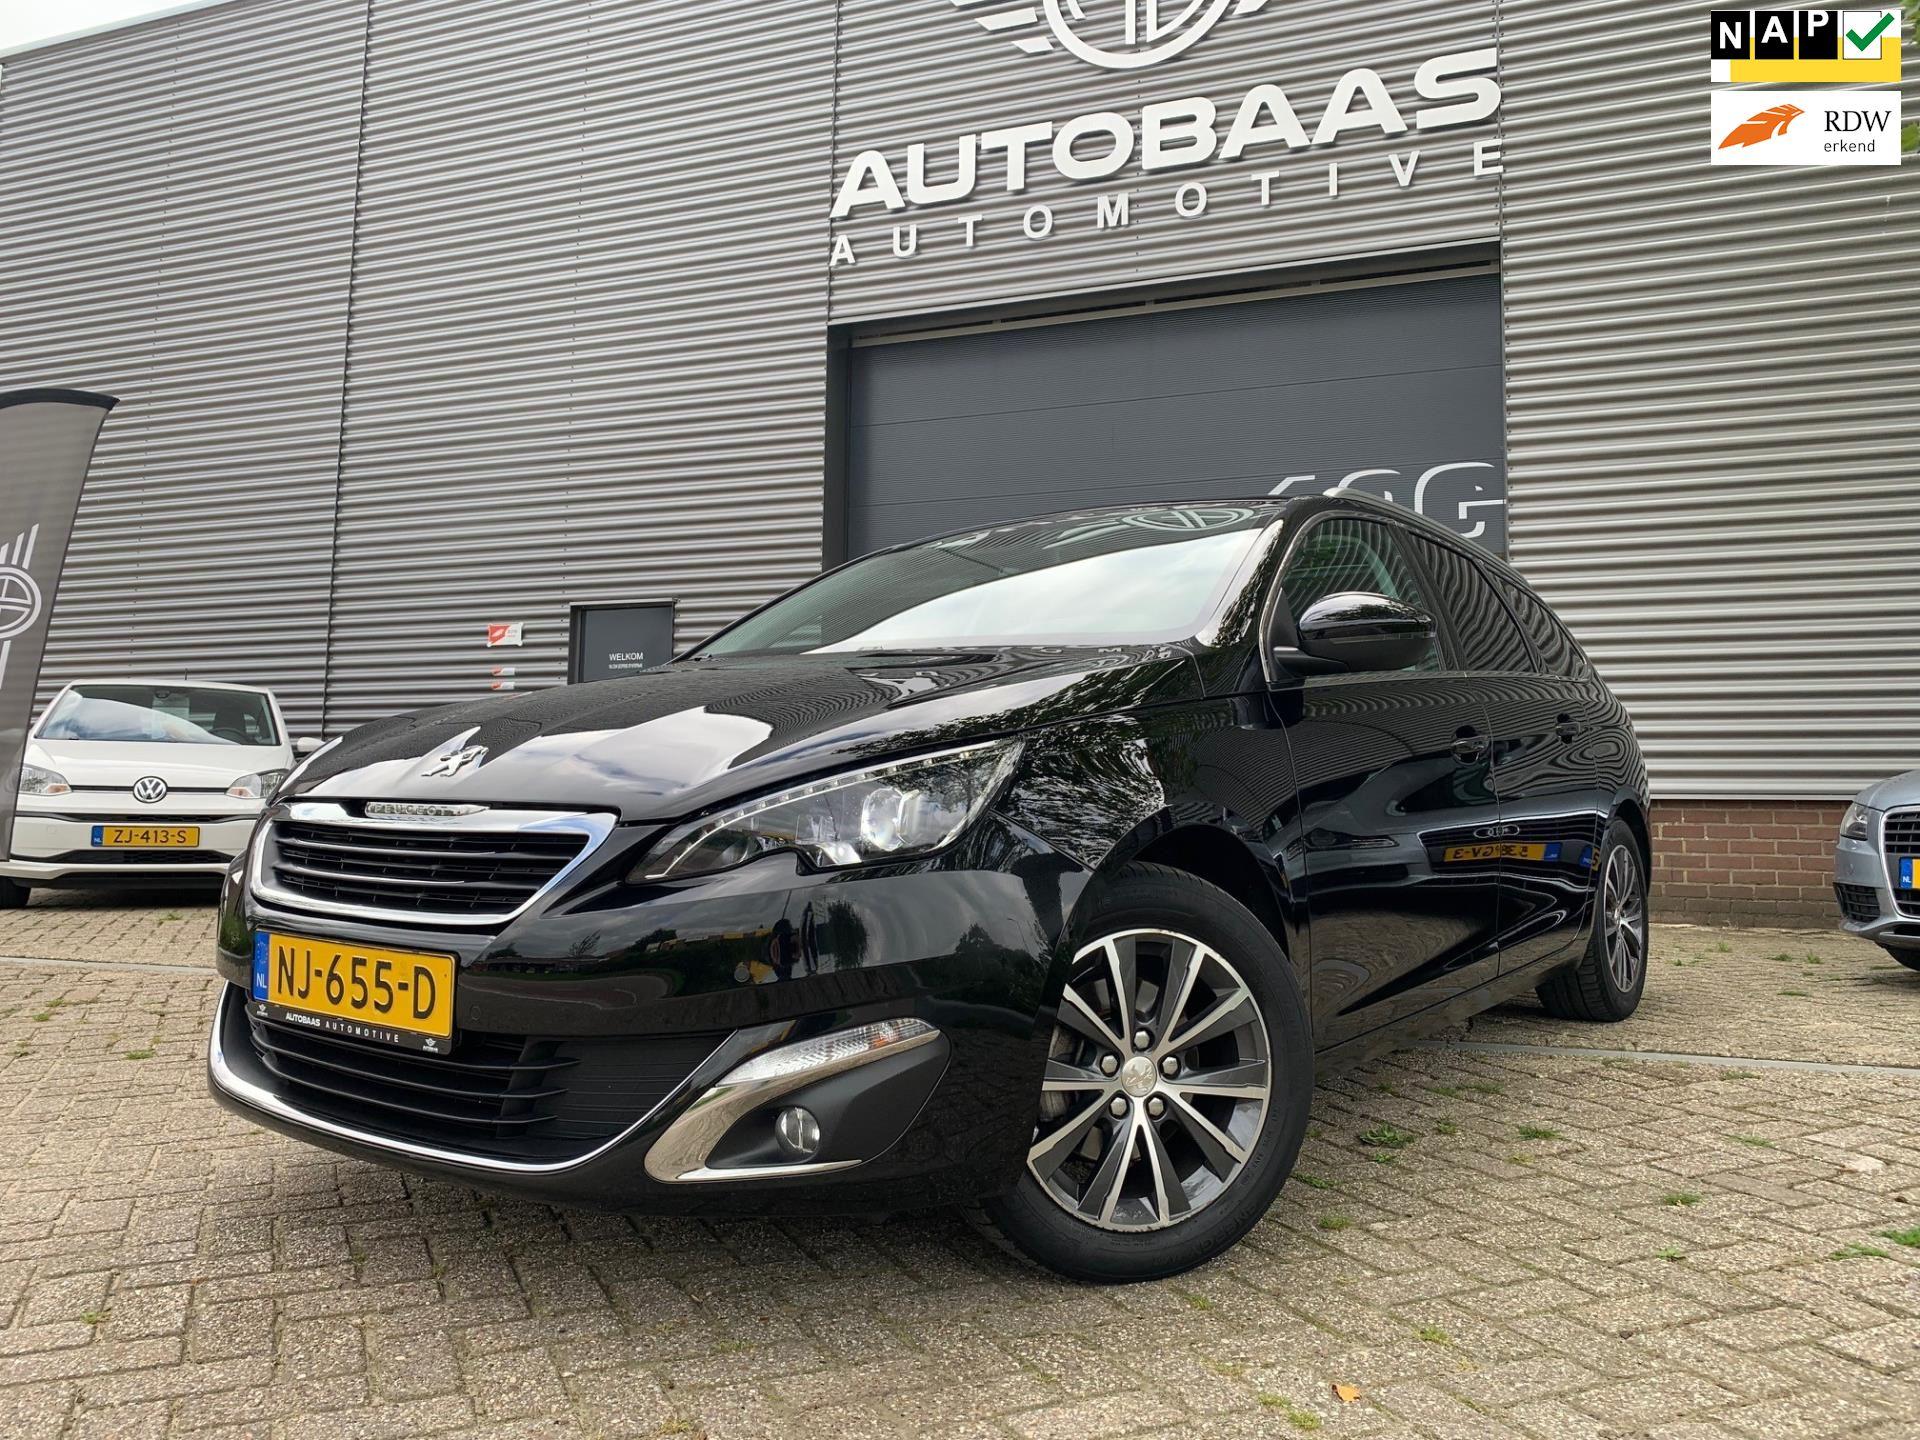 Peugeot 308 SW occasion - Autobaas Automotive